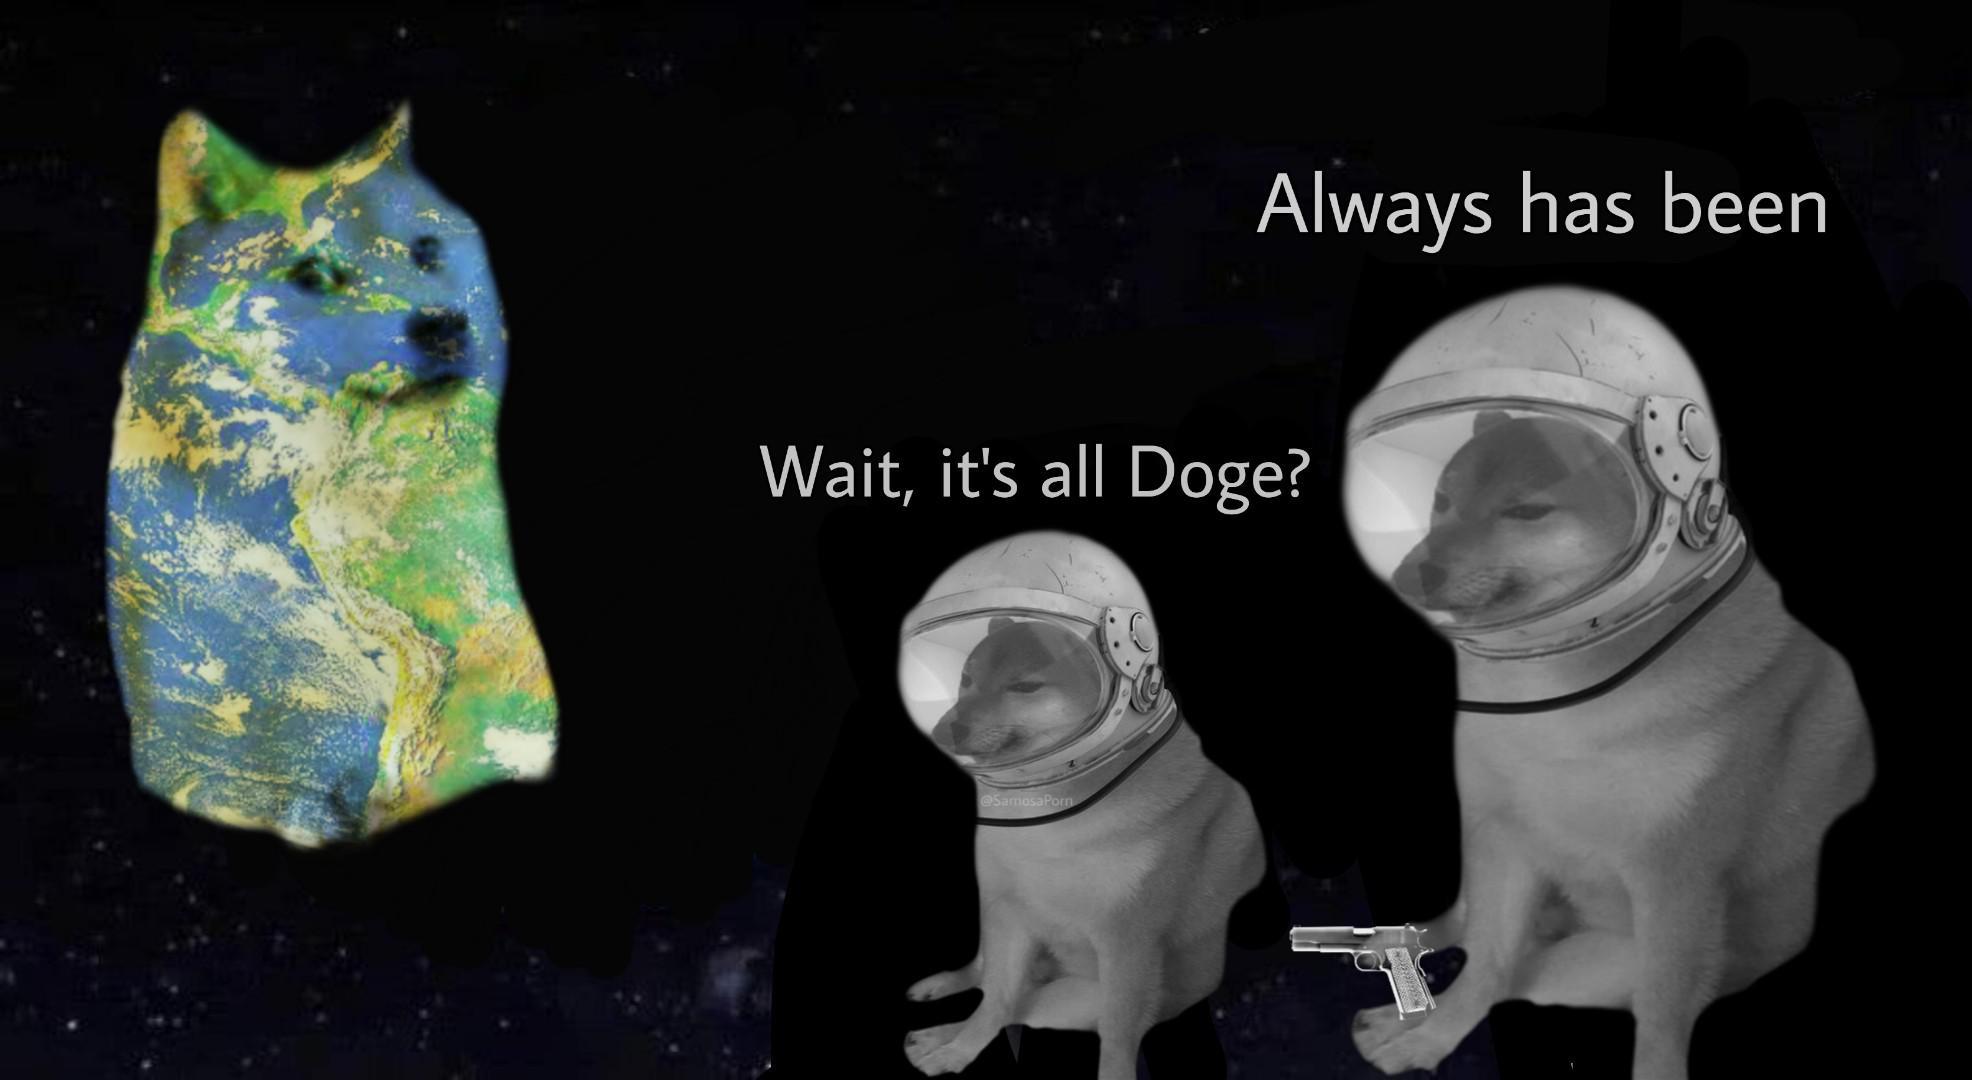 its all doge meme, its all doge astronaut meme, always has been meme, always has been memes, astronaut gun meme, astronaut gun memes, wait its all meme, wait its all memes, wait its all always has been meme, wait its all always has been memes, astronaut with a gun meme, astronaut with a gun memes, astronaut with gun meme, astronaut with gun memes, astronaut conspiracy meme, astronaut conspiracy memes, space conspiracy meme, space conspiracy memes, funny astronaut gun meme, funny astronaut with gun meme, funny astronaut gun memes, funny astronaut with gun memes, funny always has been meme, funny always has been memes, funny wait its all meme, funny wait its all memes, funny astronaut meme, funny astronaut memes, conspiracy theory meme, conspiracy theory memes, conspiracy theories meme, conspiracy theories memes, funny conspiracy theory meme, funny conspiracy theory memes, funny conspiracy theories meme, funny conspiracy theories memes